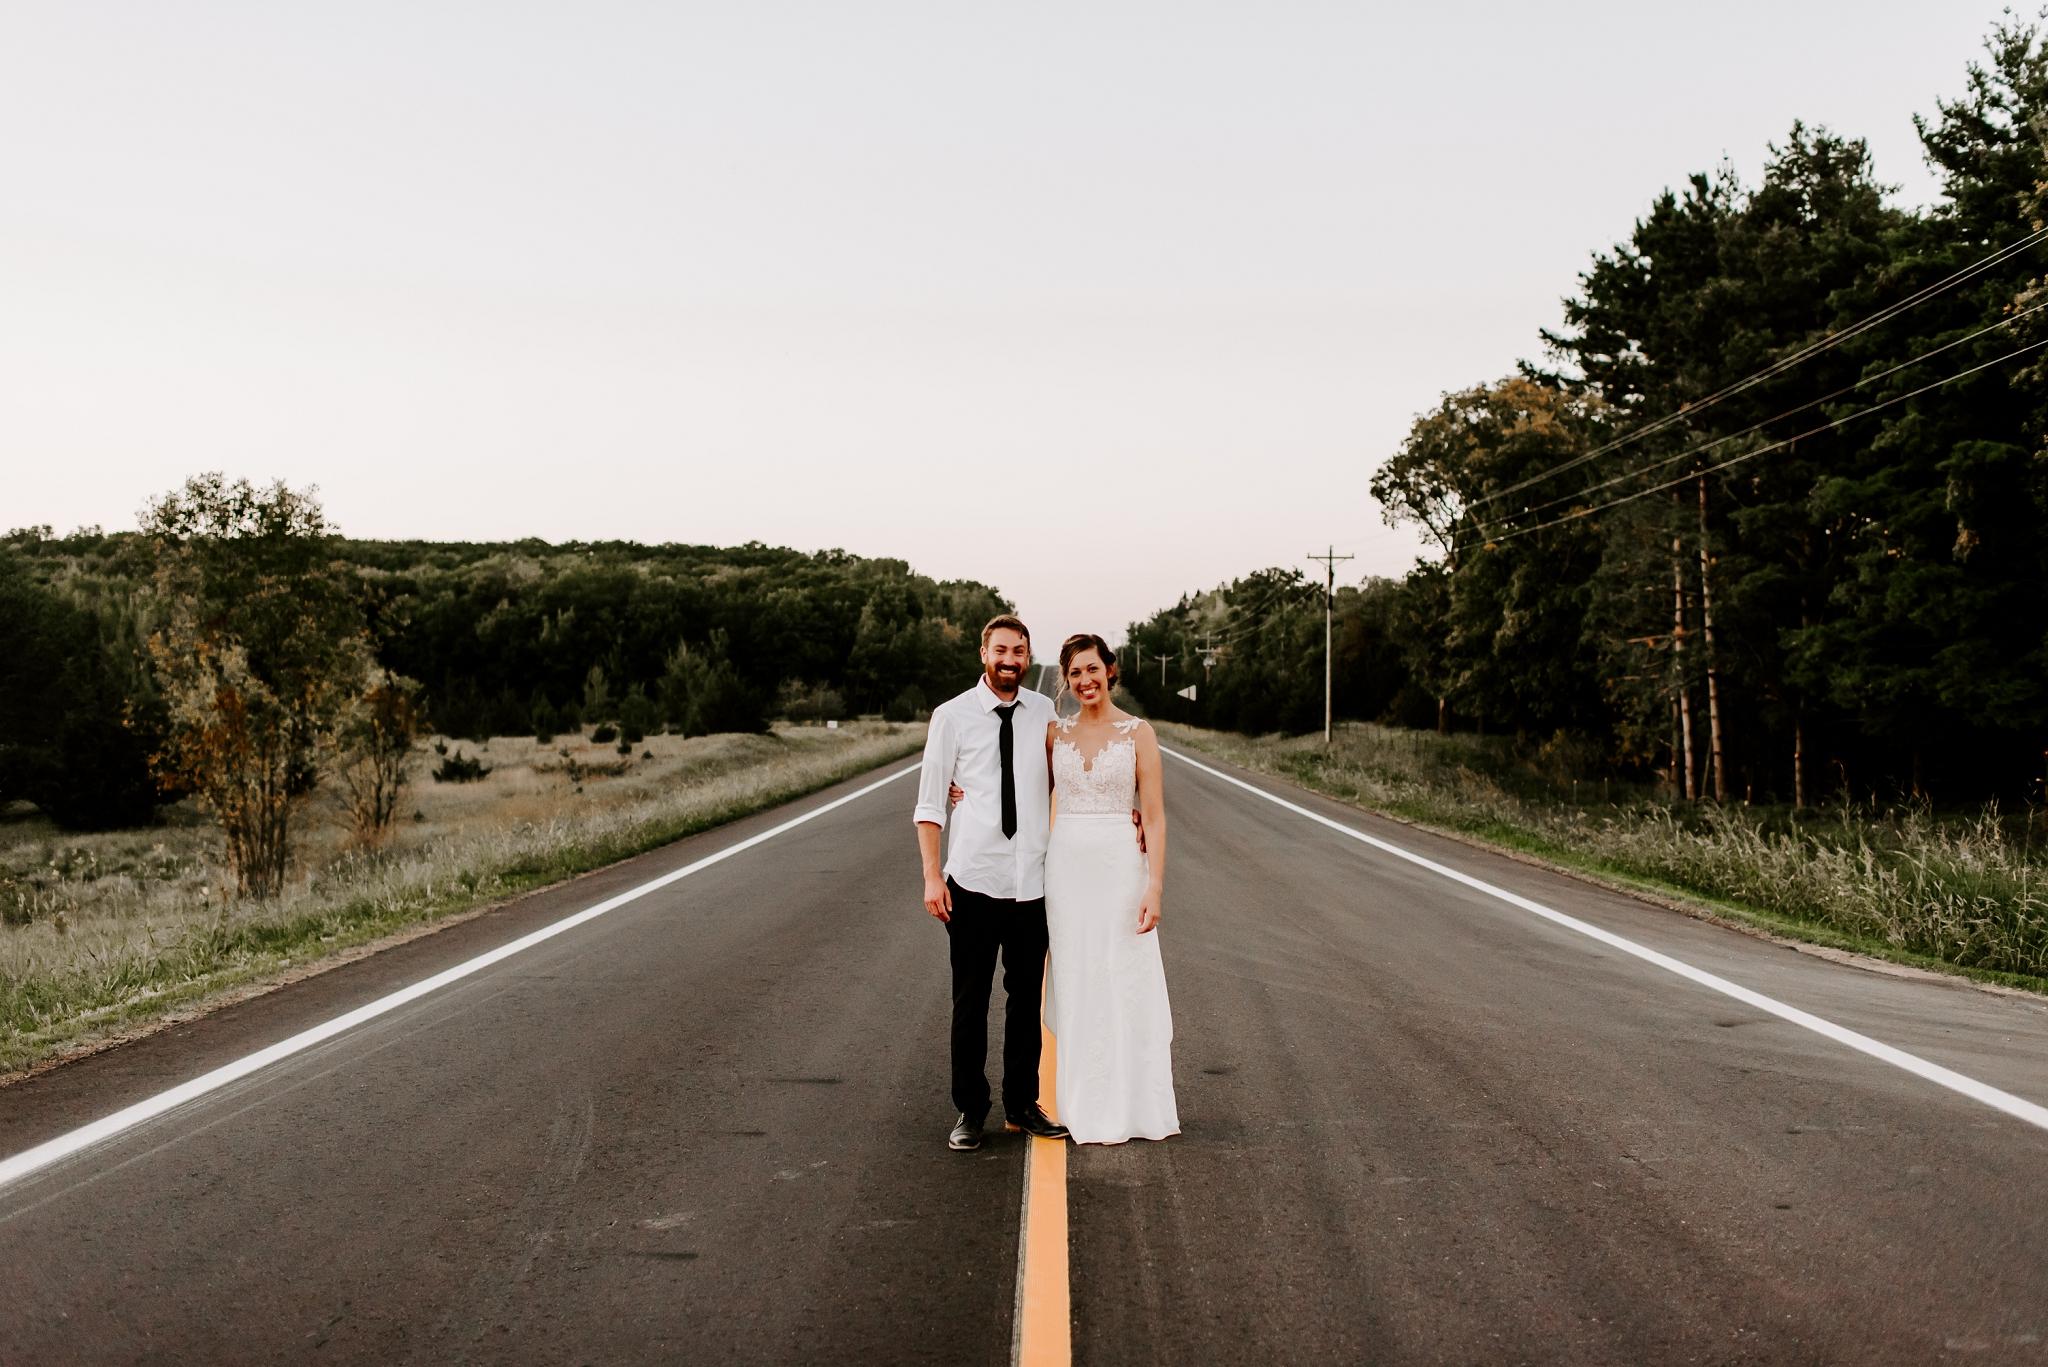 DUSTIN + STACEY - RUSTIC BARN WEDDING